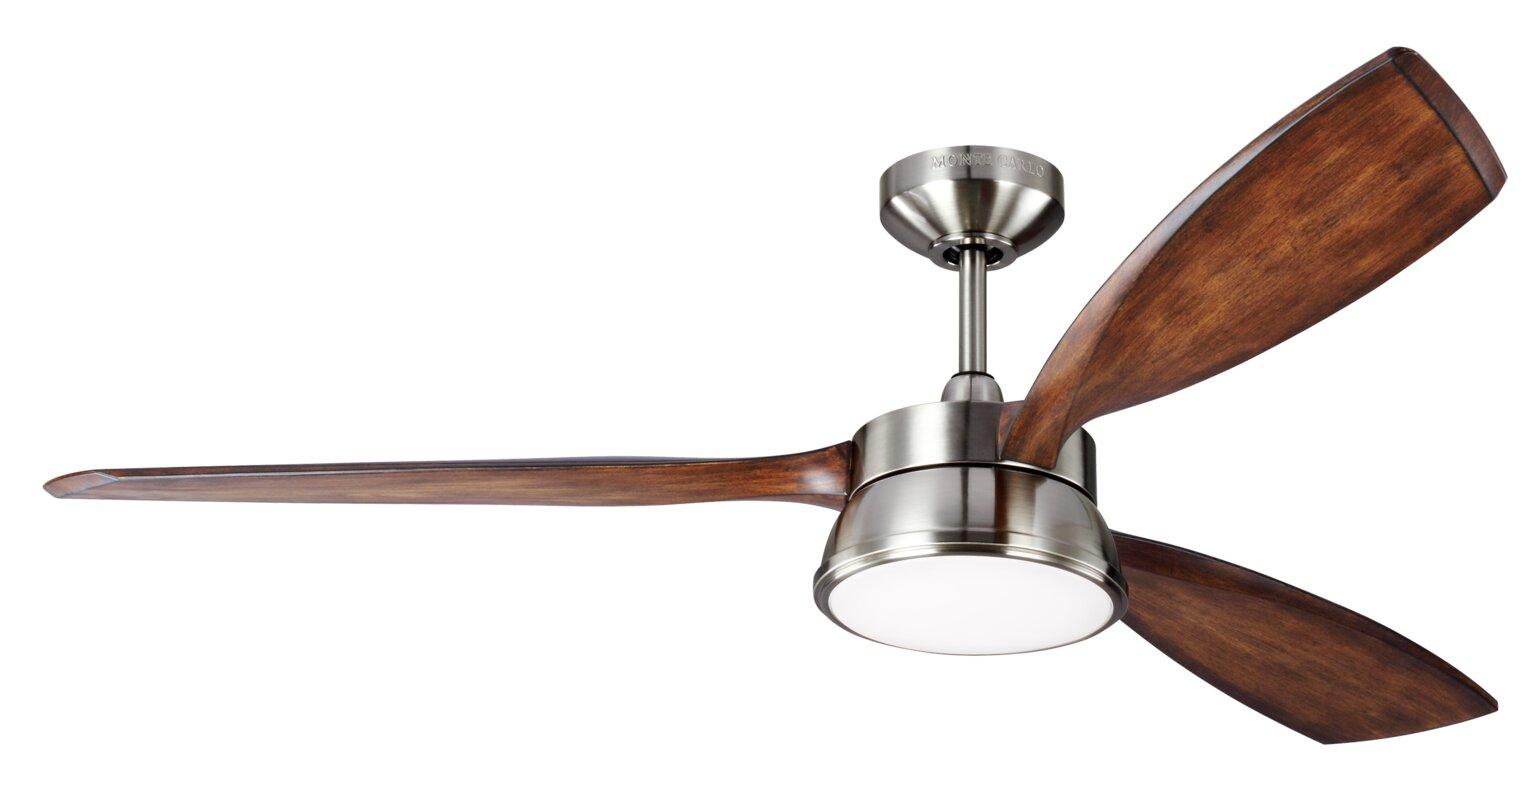 Laurel foundry modern farmhouse 57 fougeres 3 blade outdoor 57 fougeres 3 blade outdoor ceiling fan with remote aloadofball Choice Image